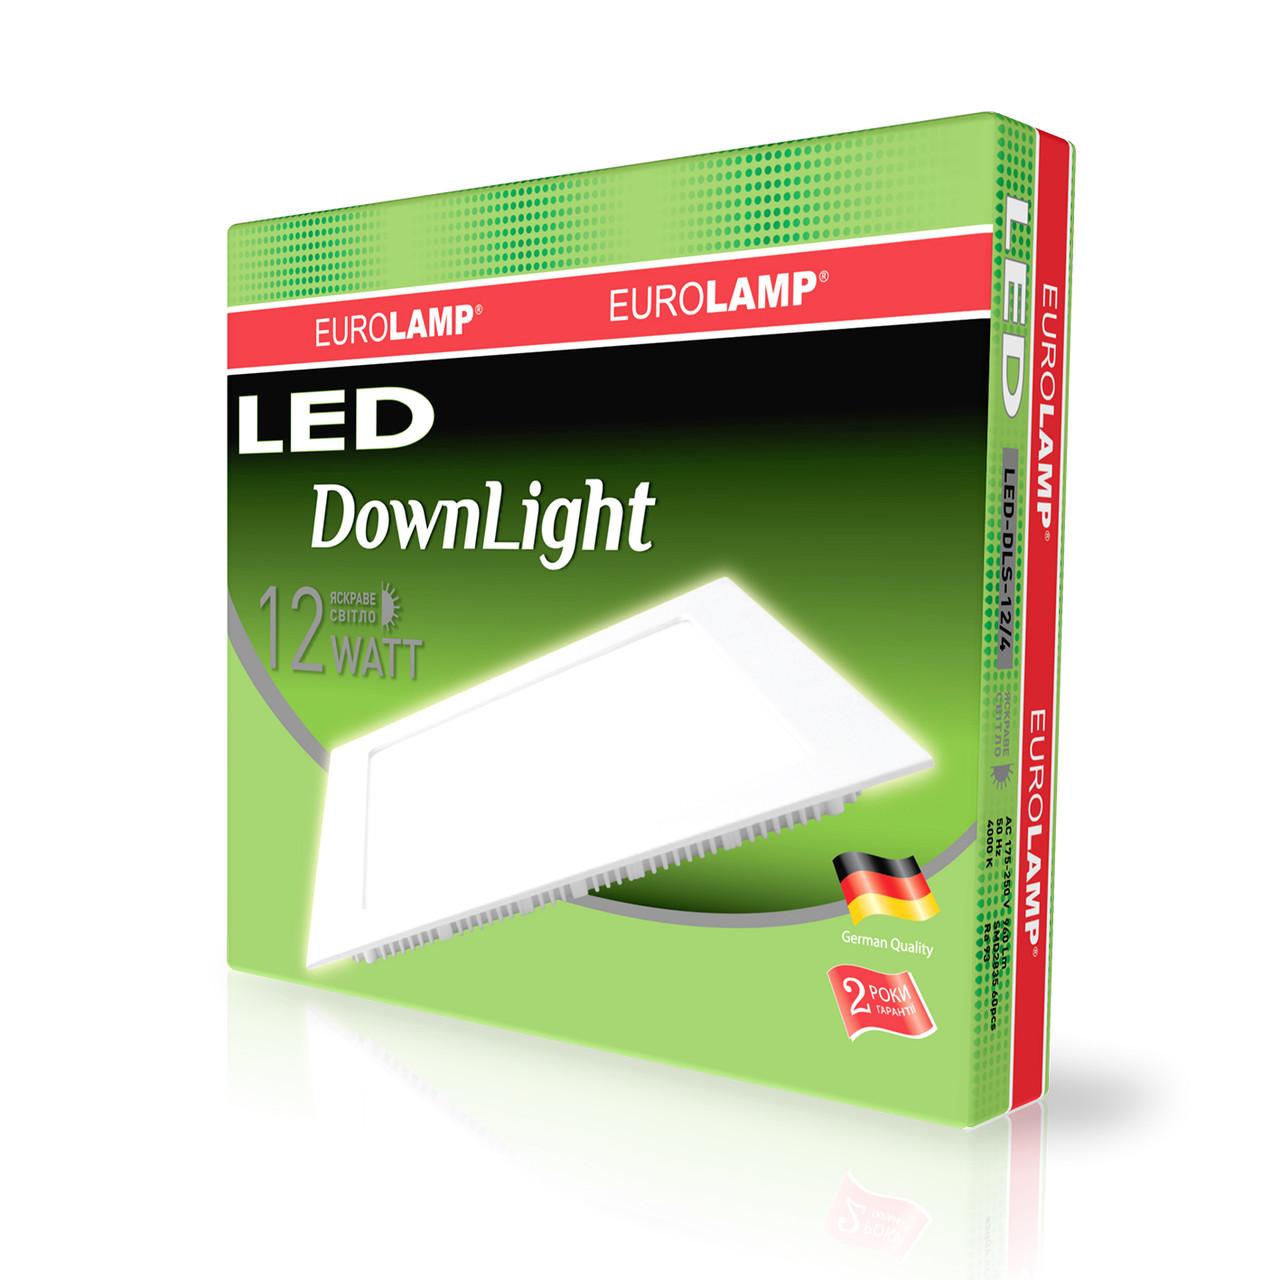 EUROLAMP LED Светильник квадратный Downlight 12W 4000K 220V